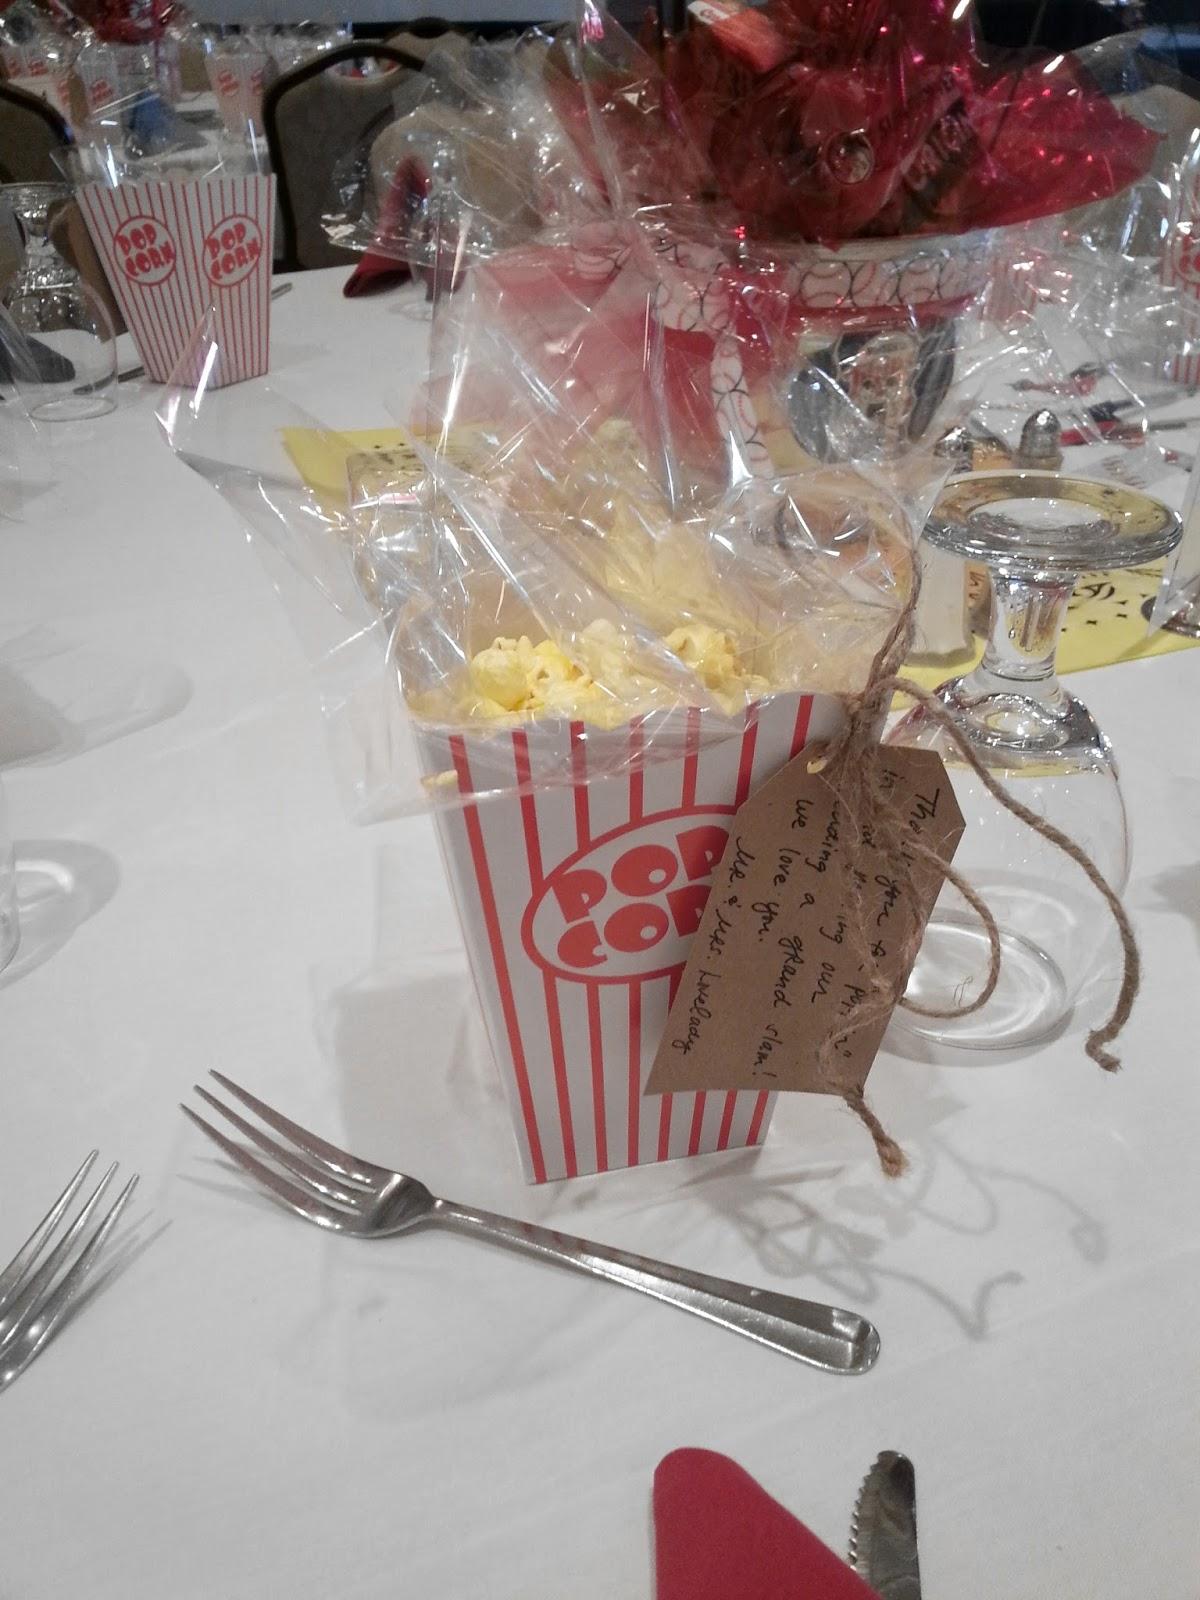 Utahs Wedding Photobooth Blog: Baseball Theme Wedding Reception